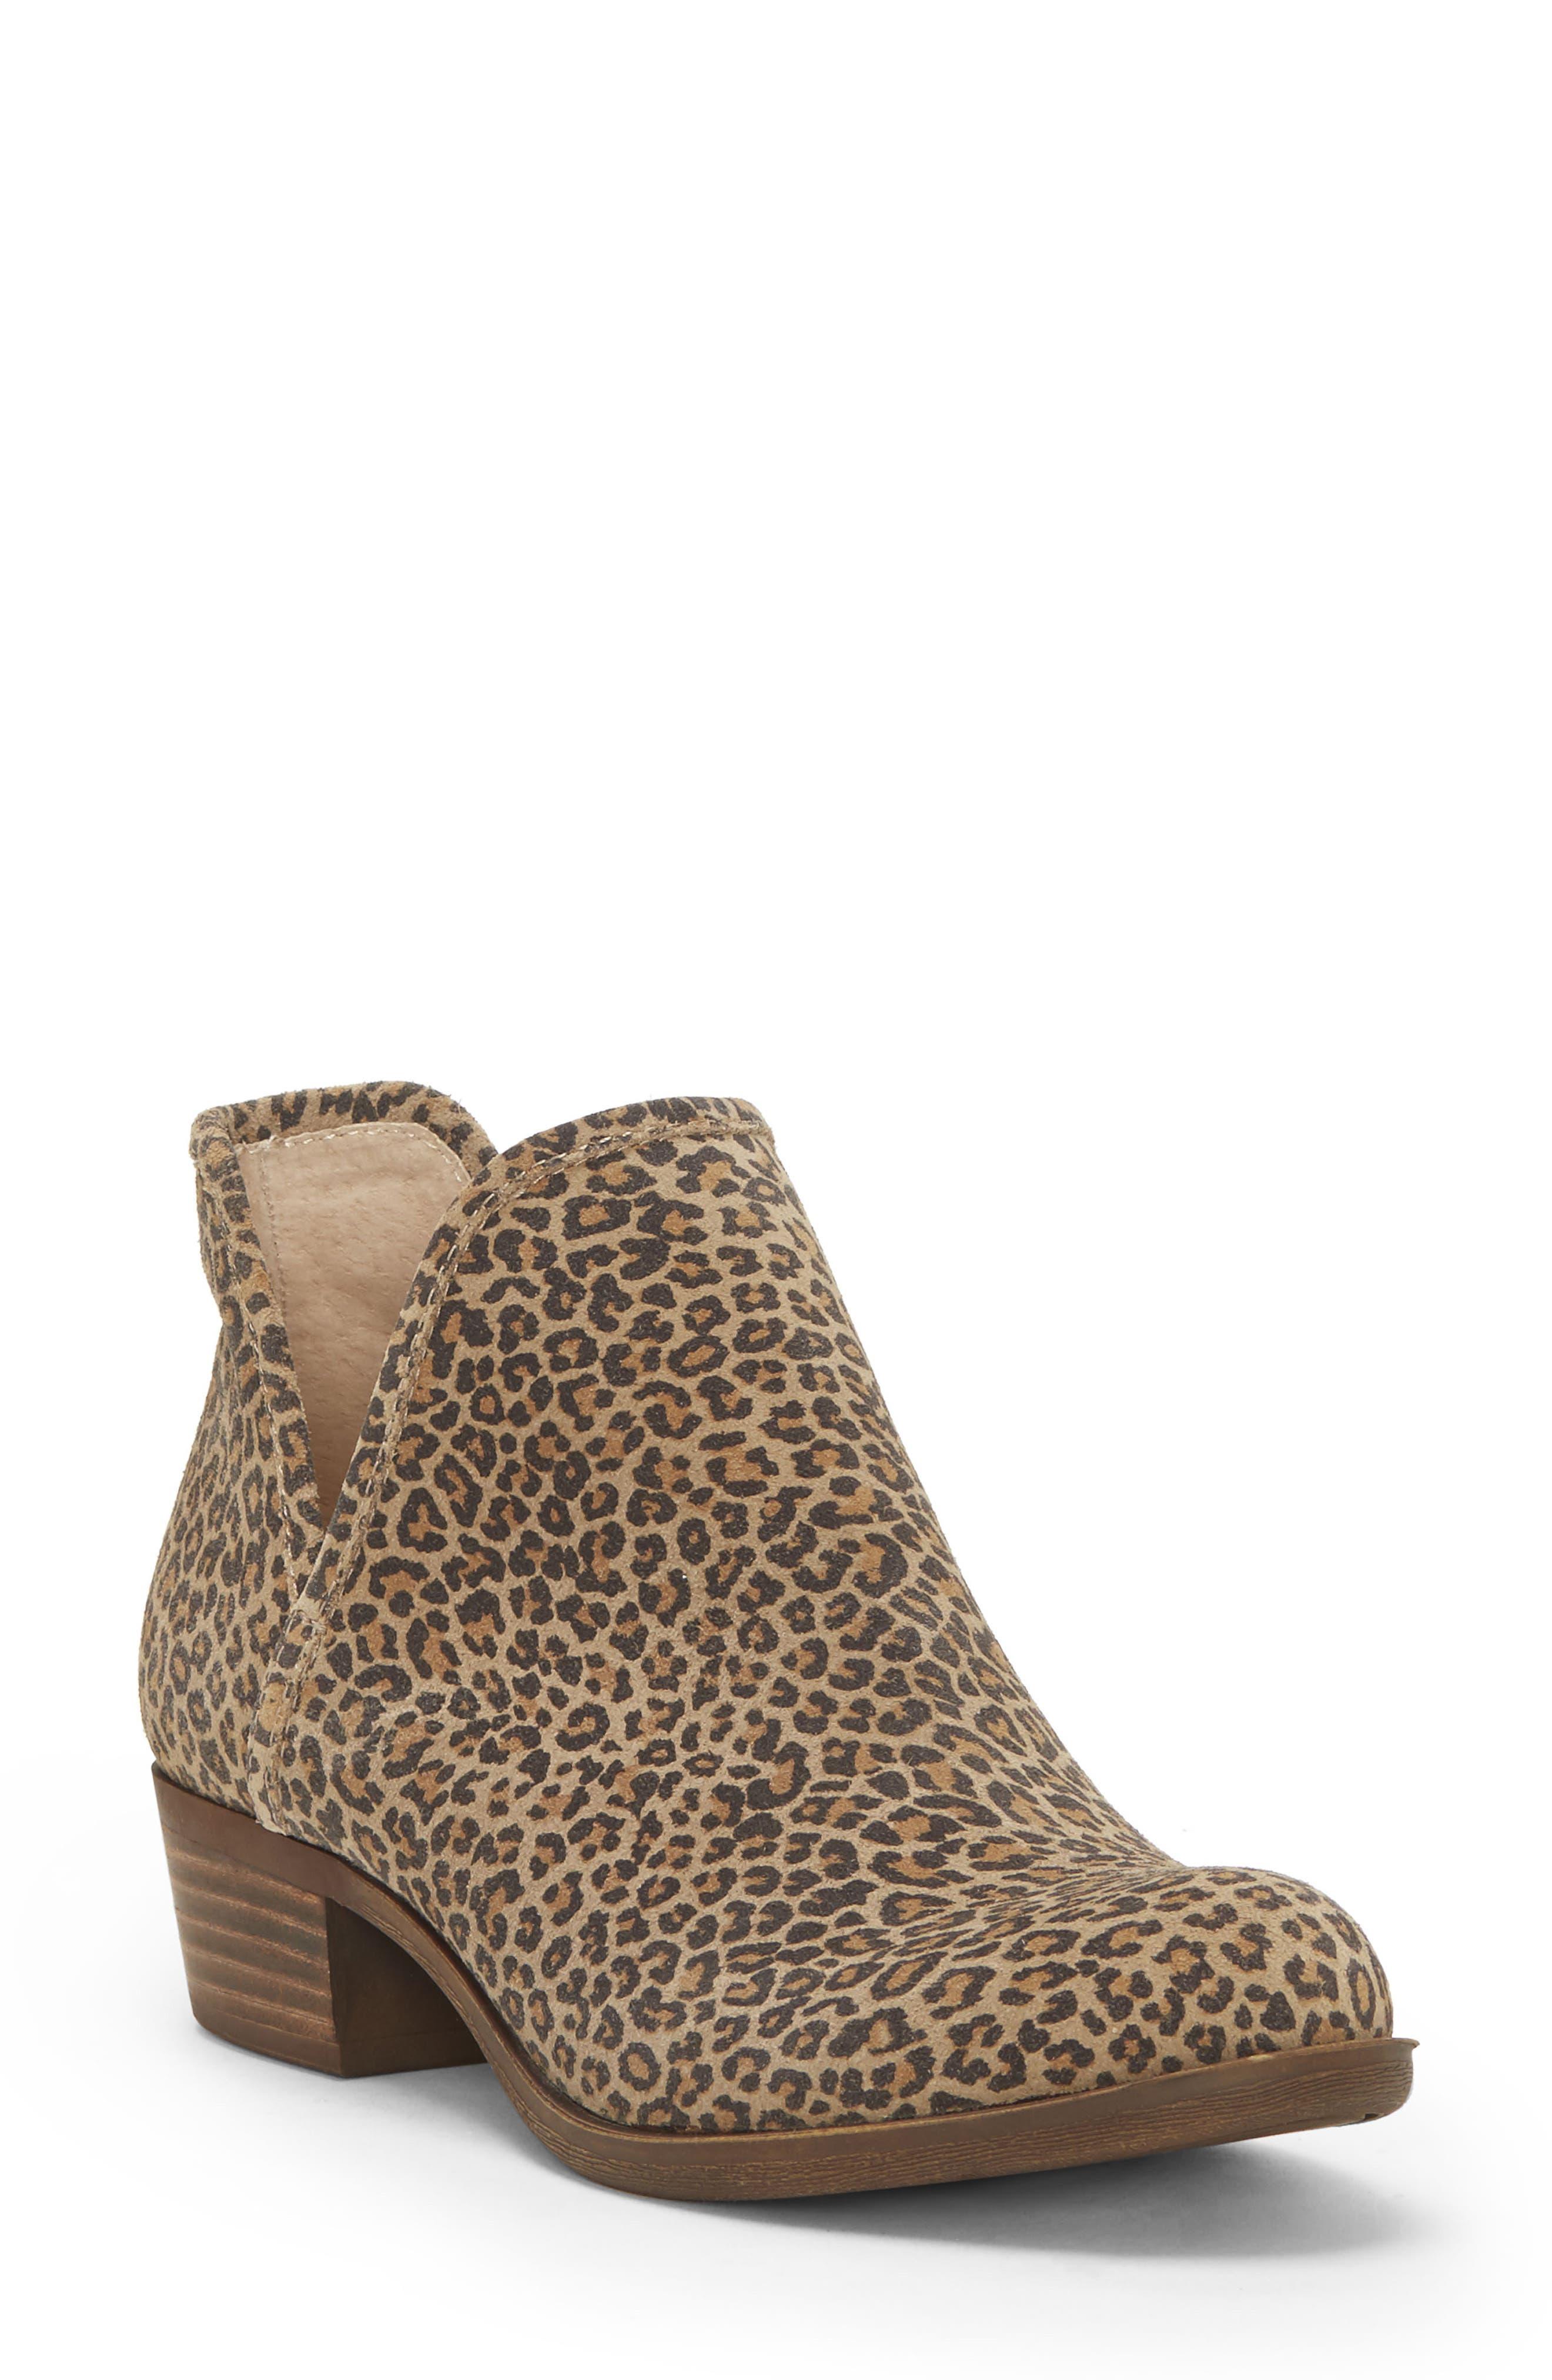 Image of Lucky Brand Baley Leather Block Heel Bootie